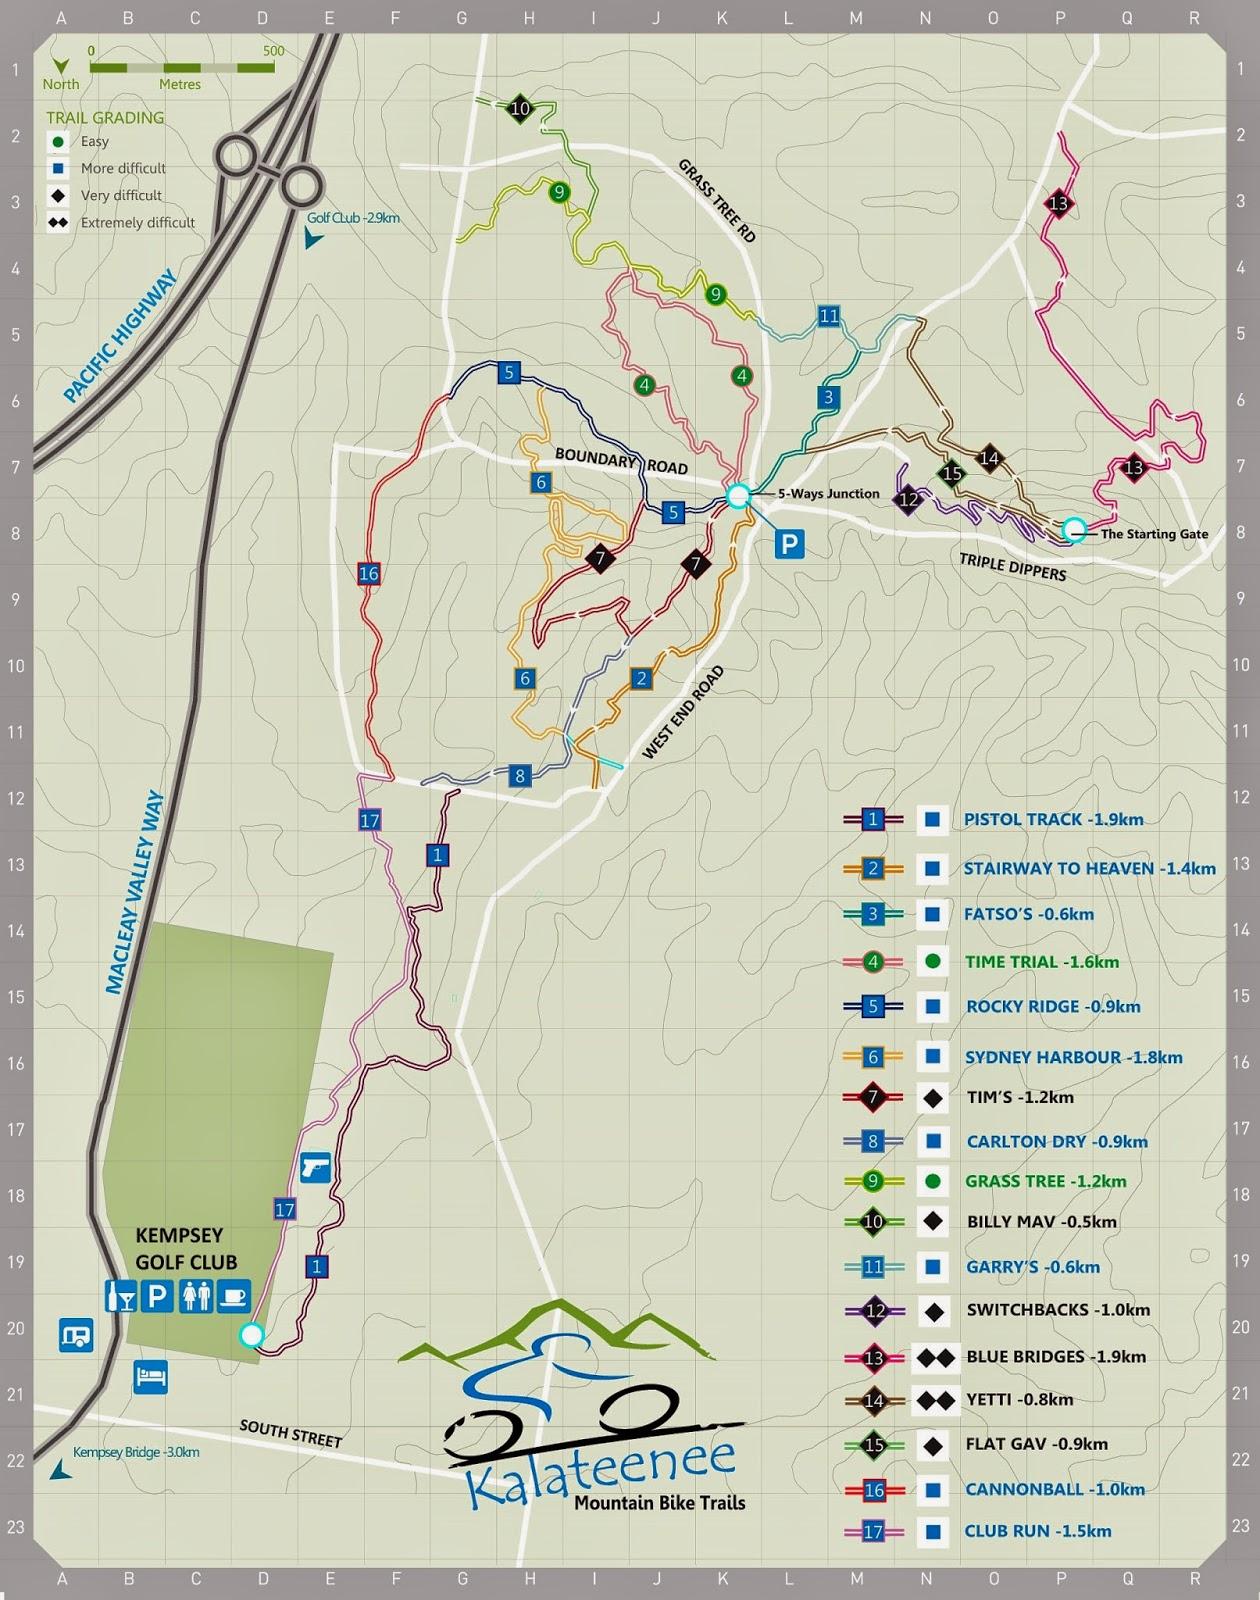 Kalateenee Trail Map